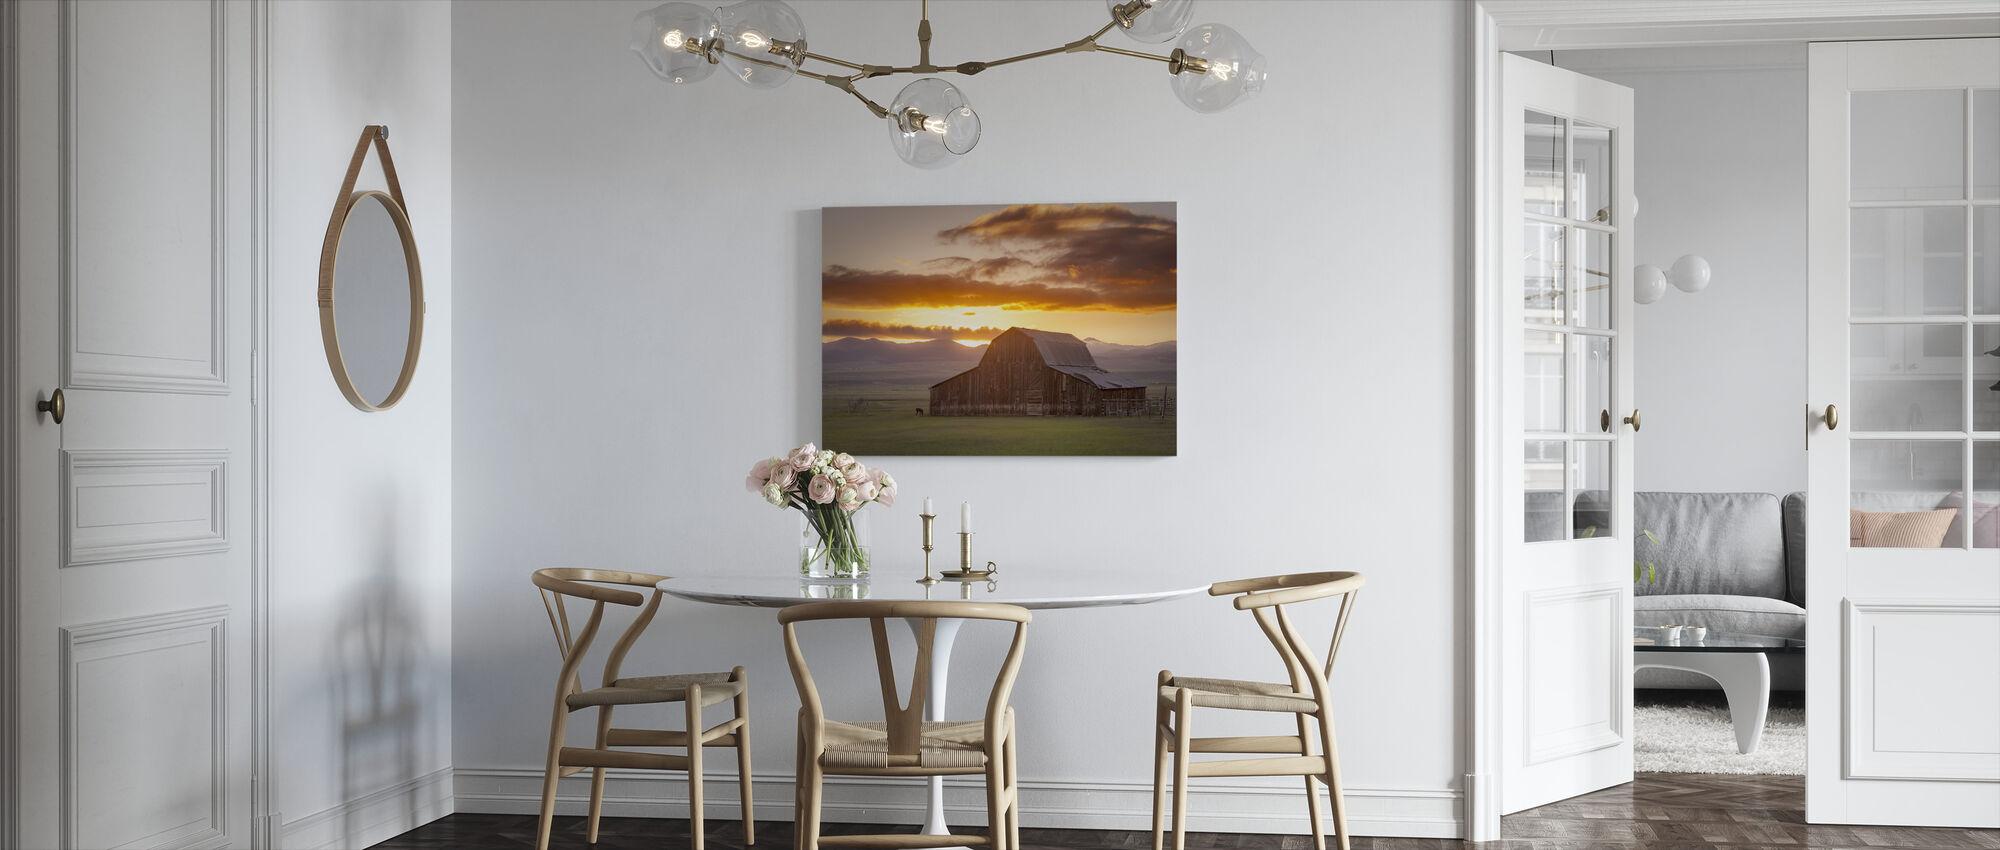 Wet Mountain Barn - Canvas print - Kitchen